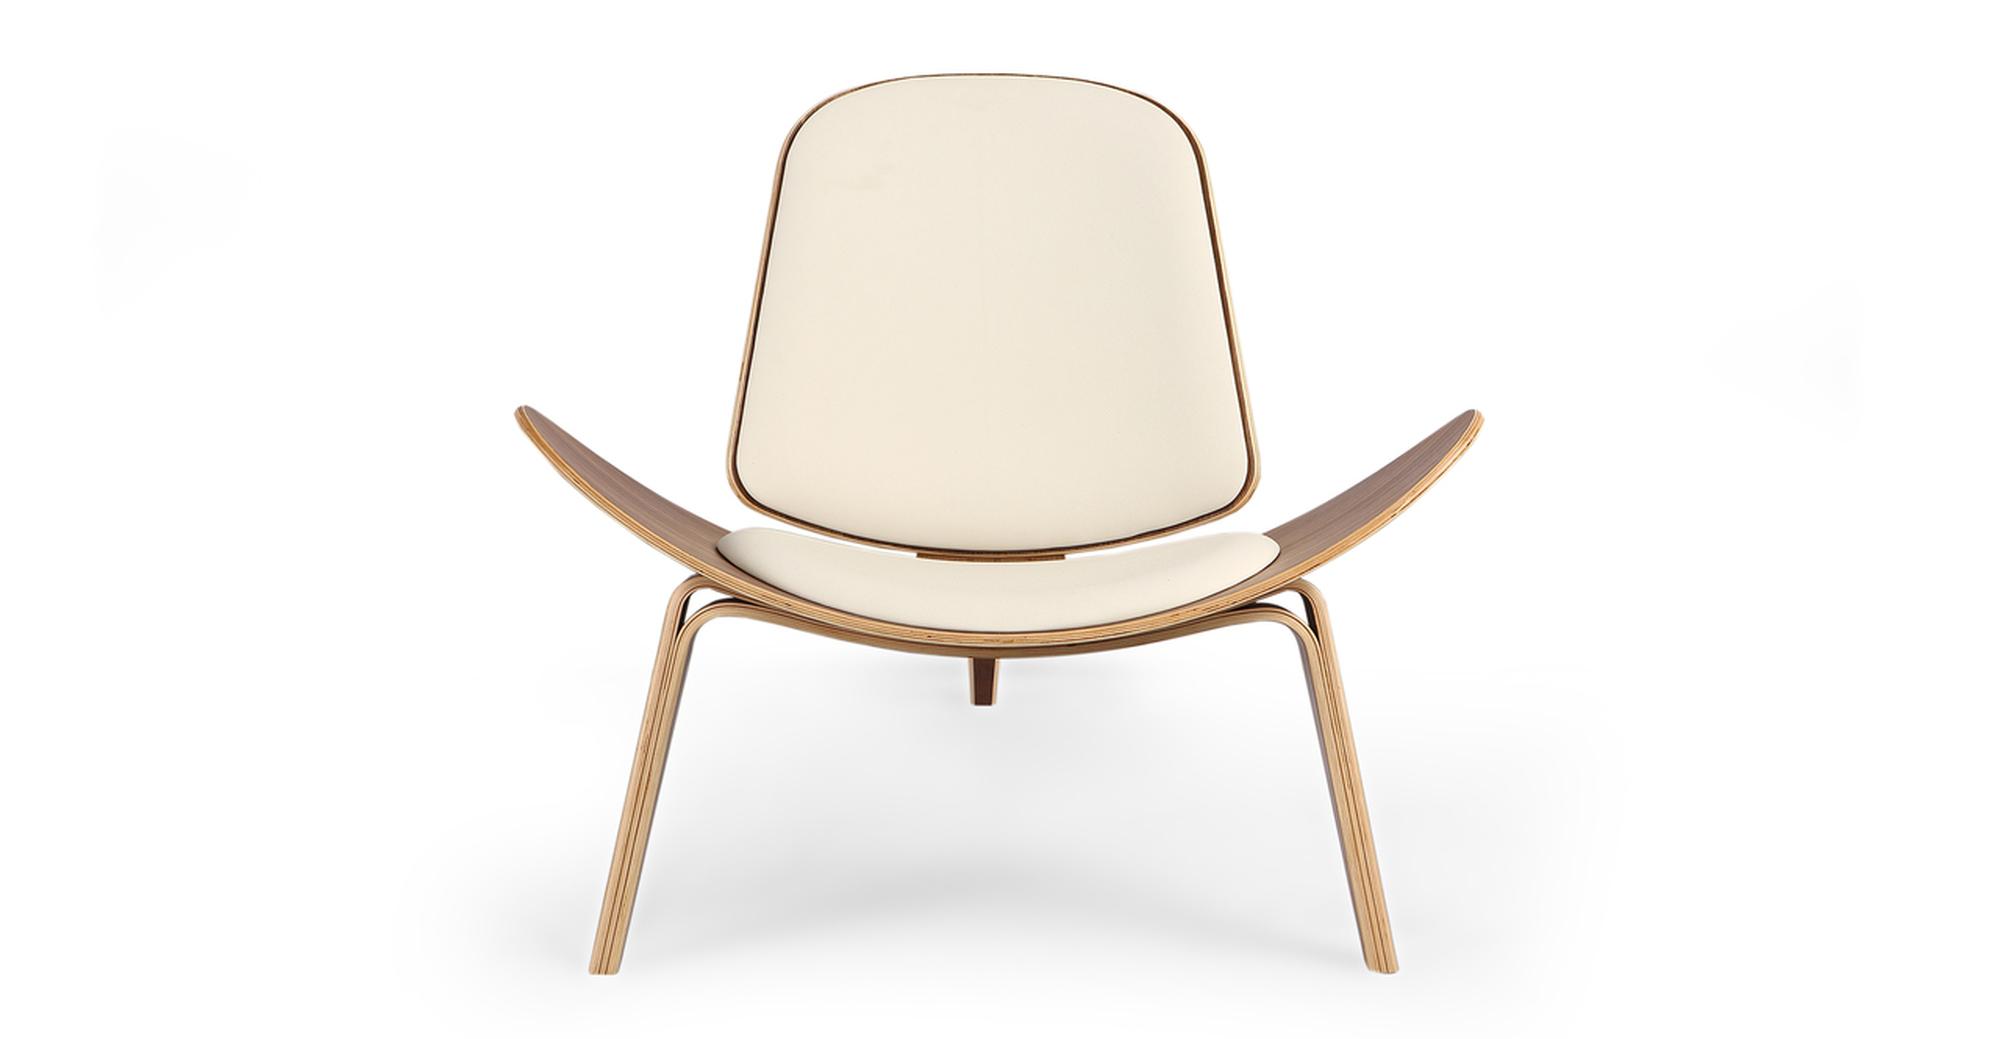 Tripod Leather Chair 2-pc Set, Walnut/Cream Italian